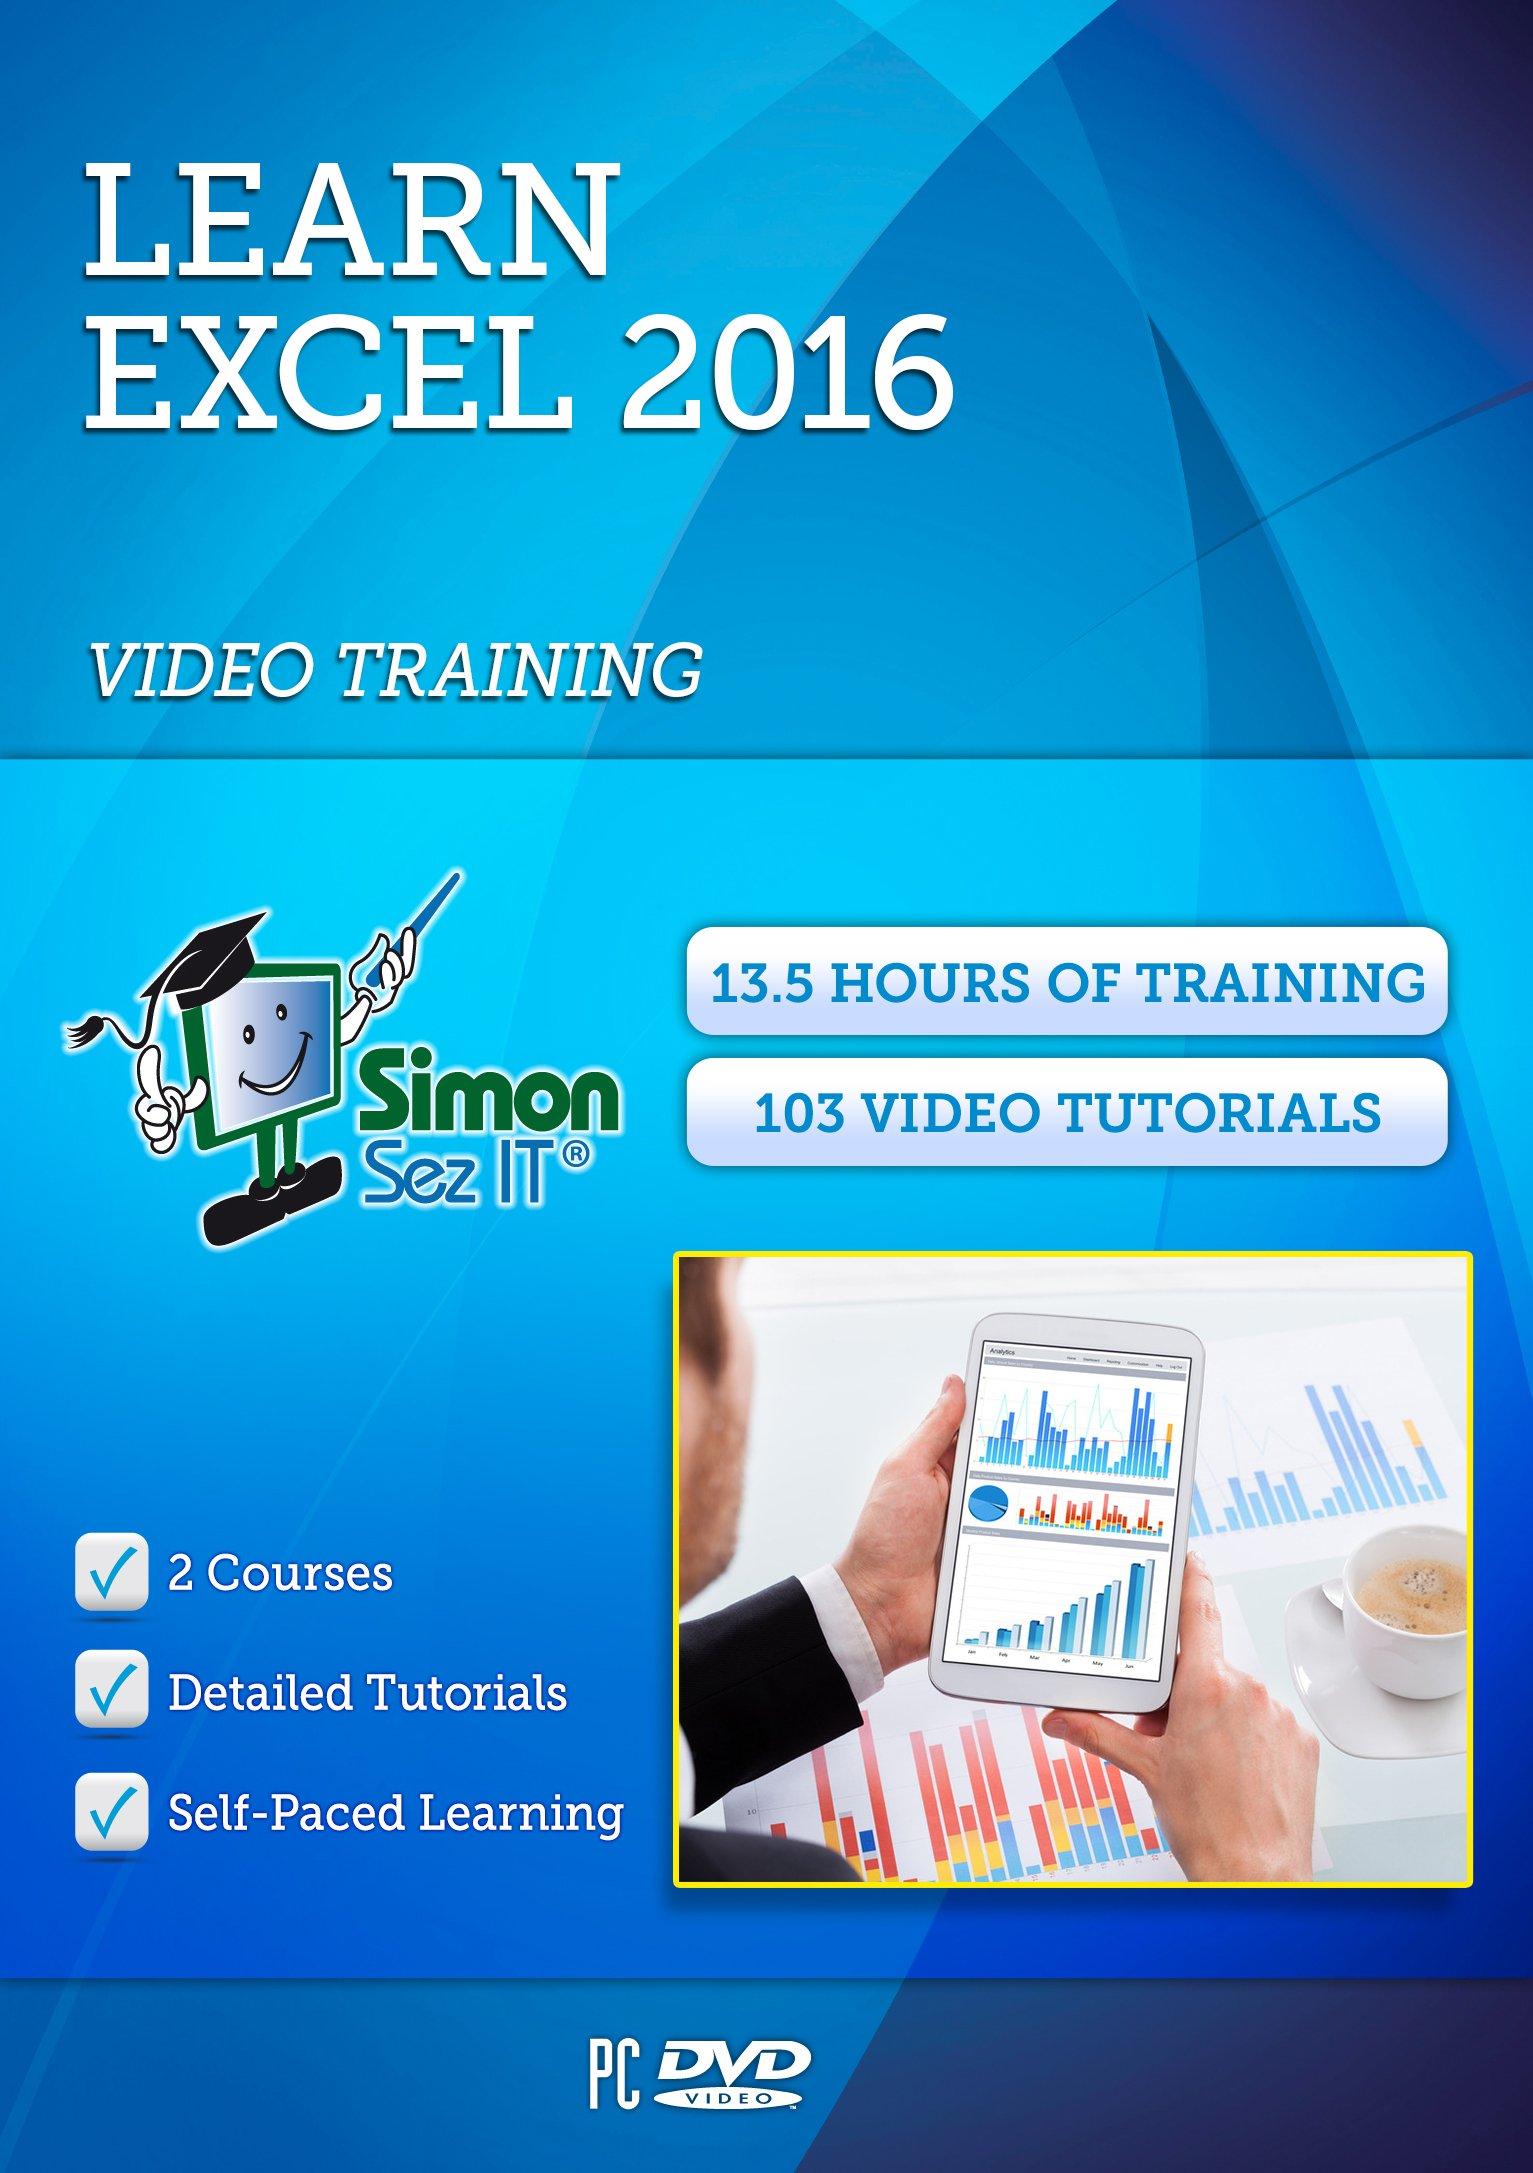 Simon Sez IT Learn Microsoft Excel 2016 Training Course - Beginner and Intermediate Level by Simon Sez IT